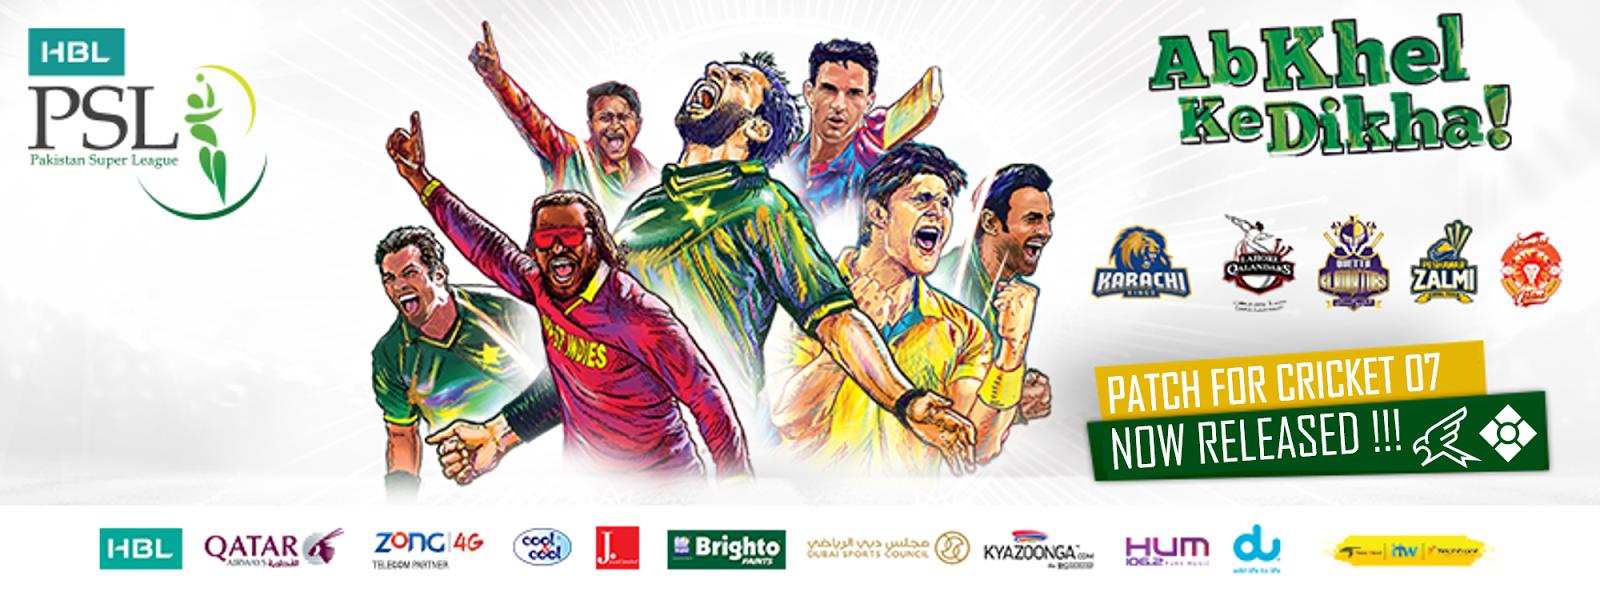 HBL PAKISTAN SUPER LEAGUE 2016 | WORLD WIDE GAME STUDIO ...